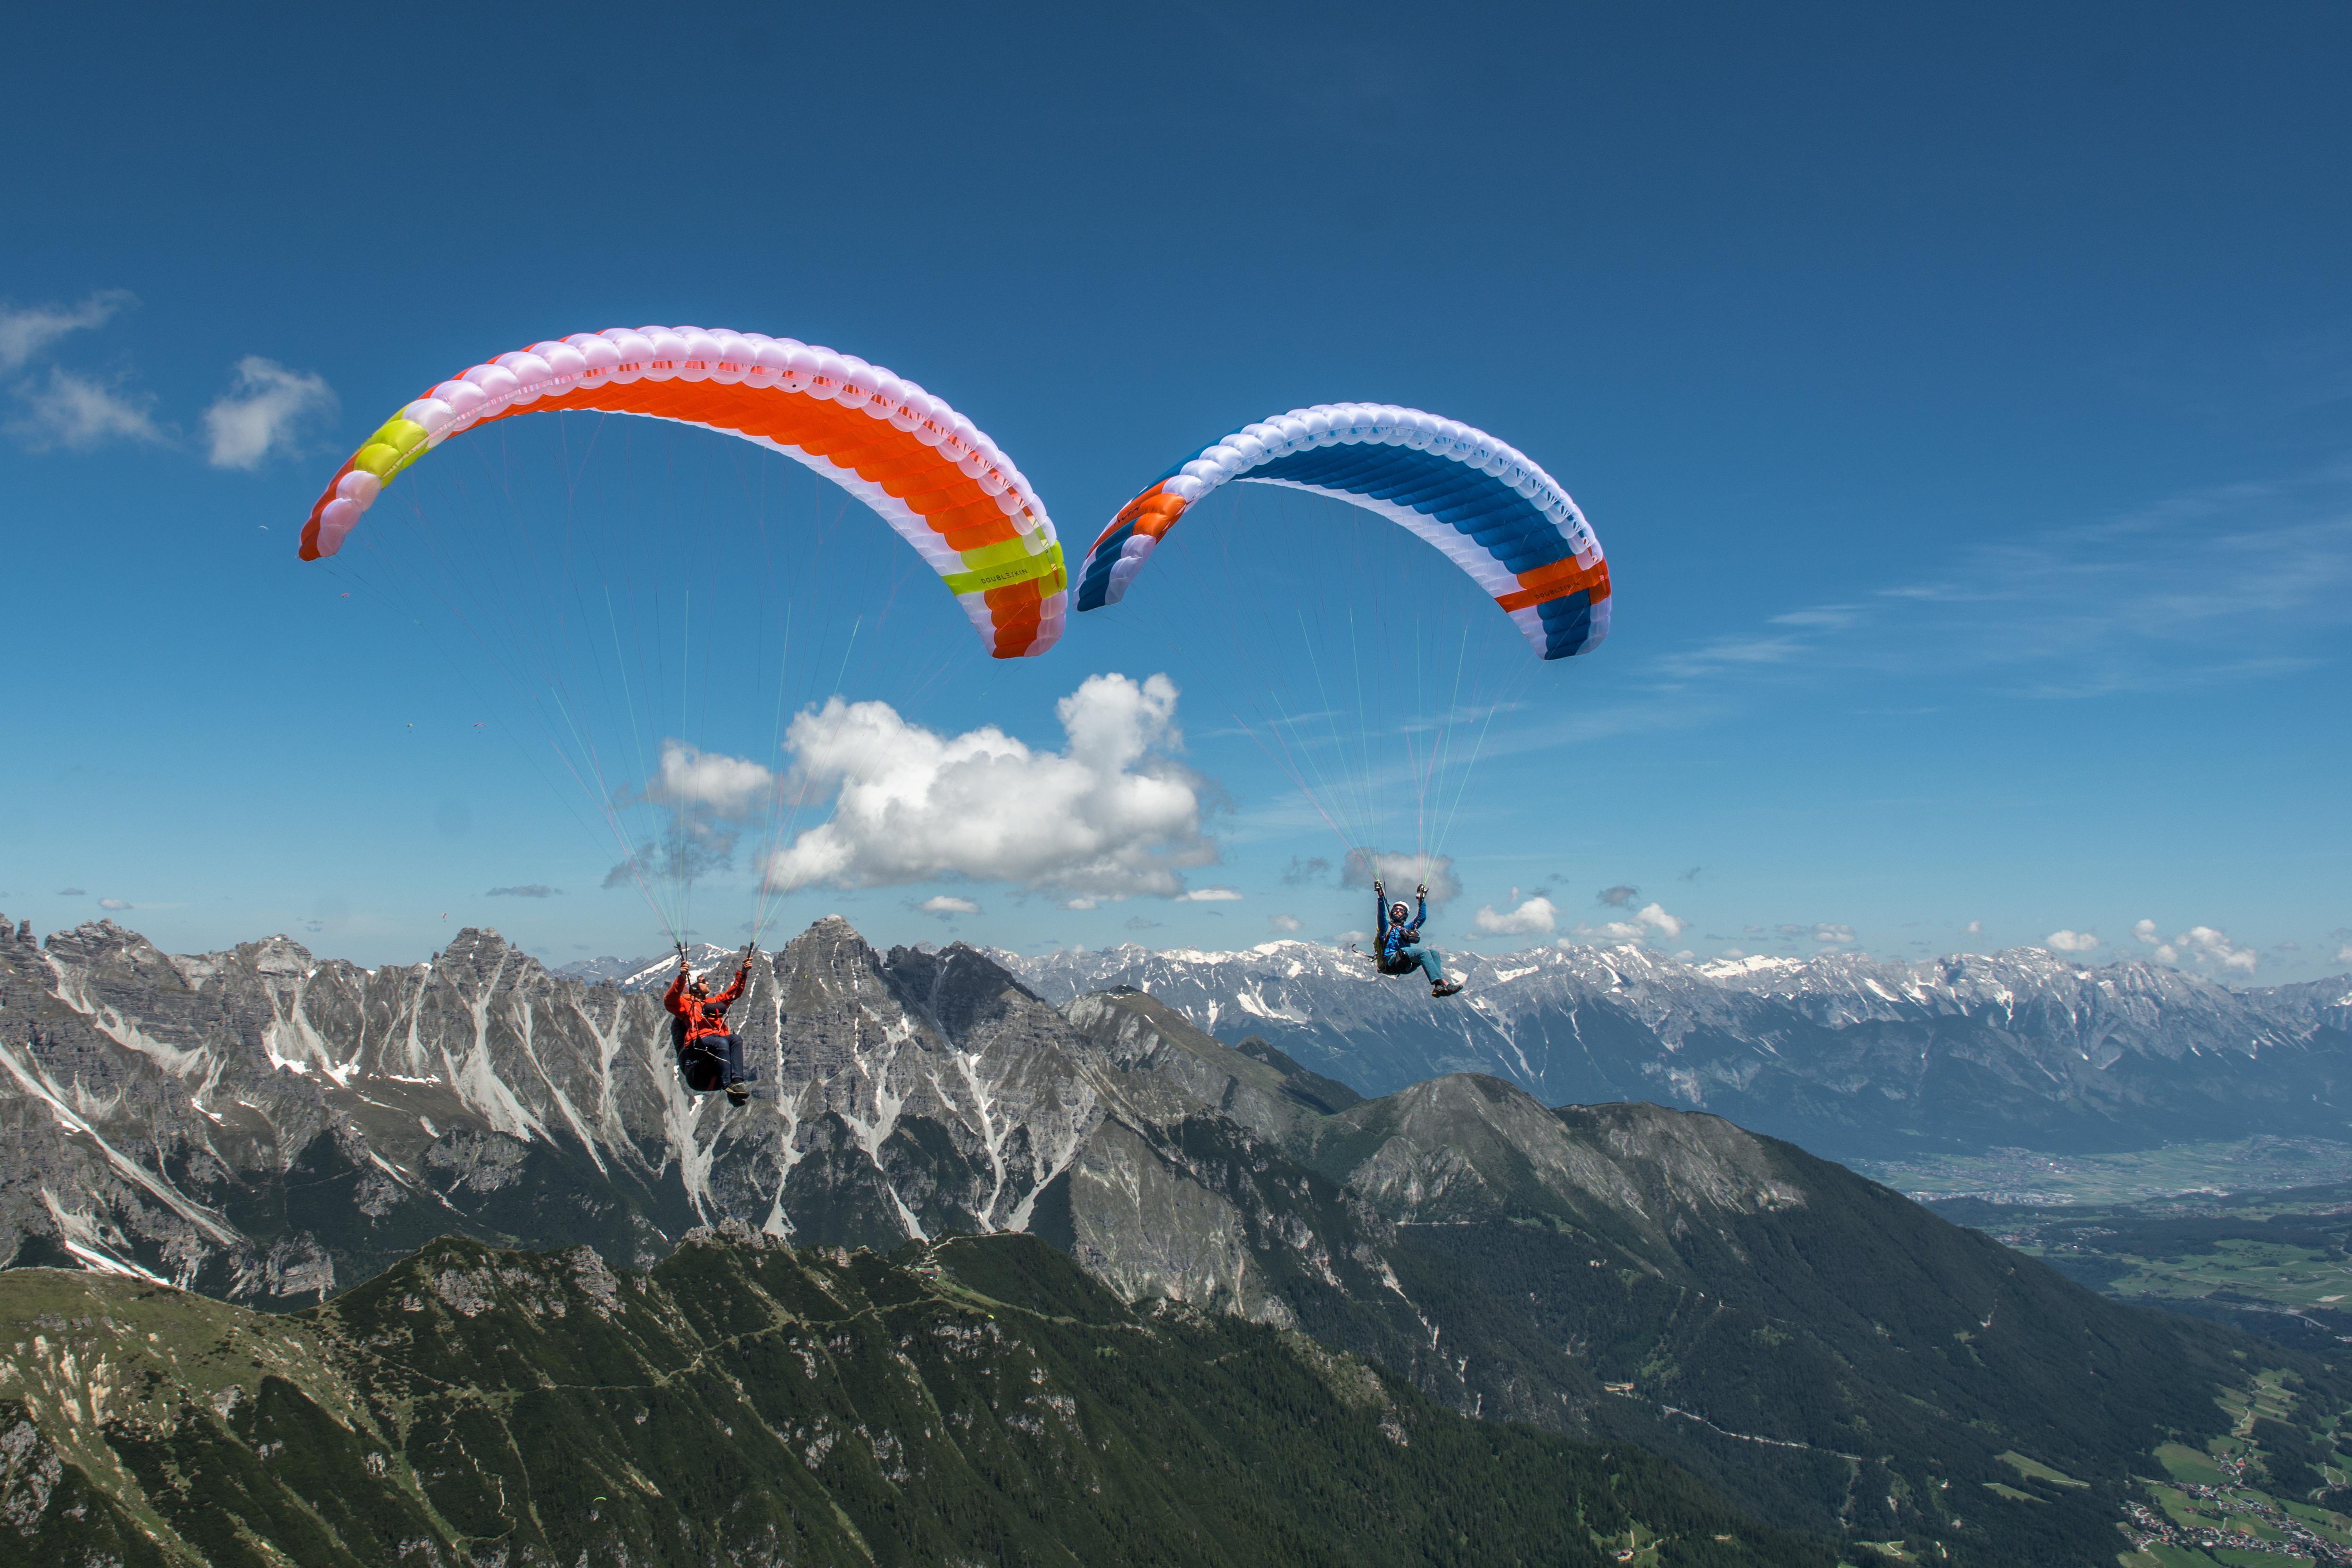 NOVA Performance Paragliders - Home